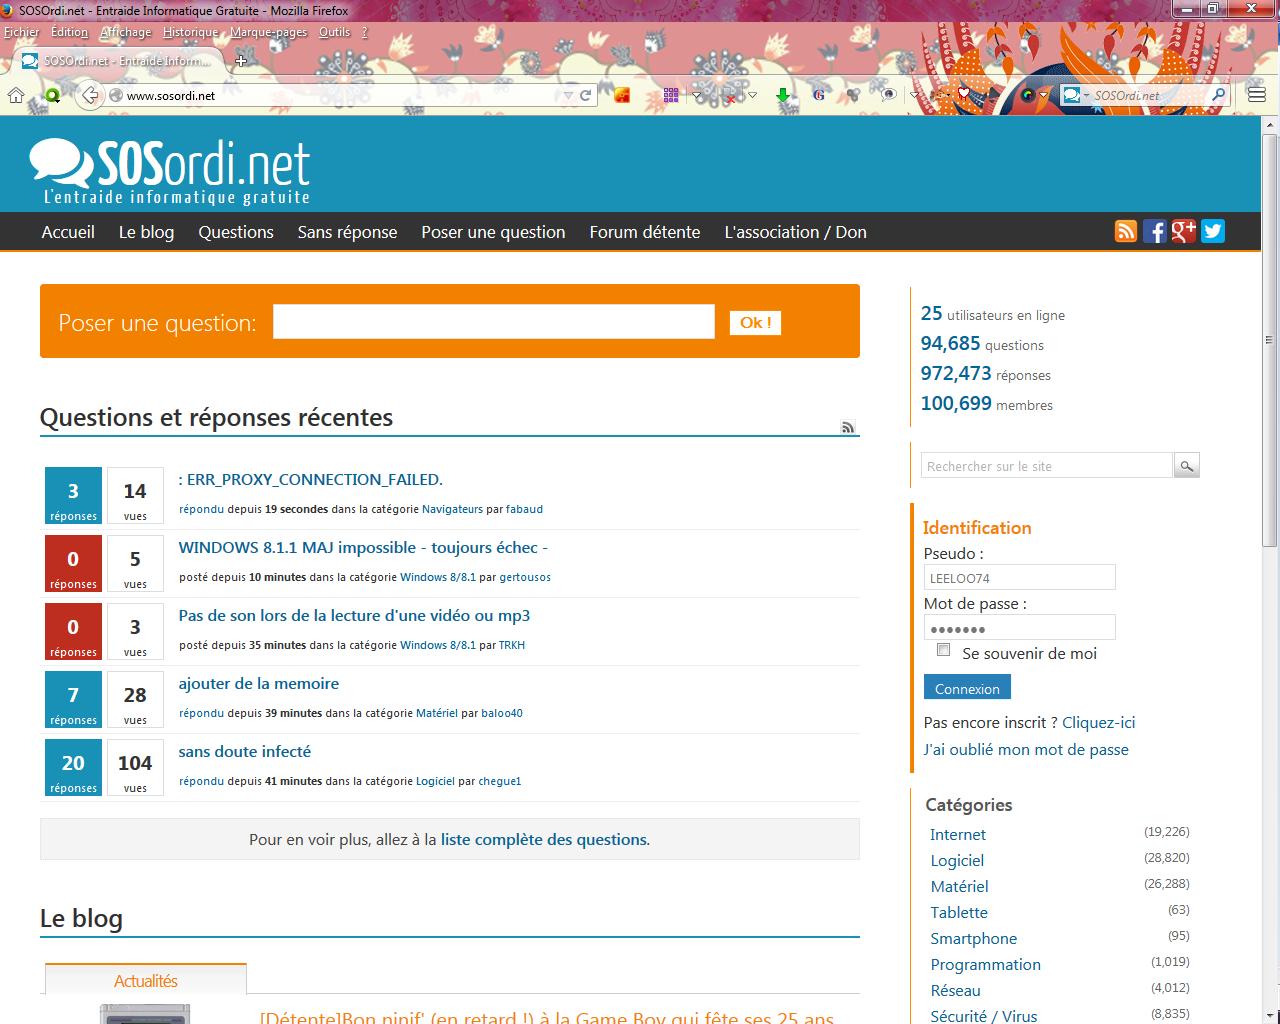 Firefox_29 Australis